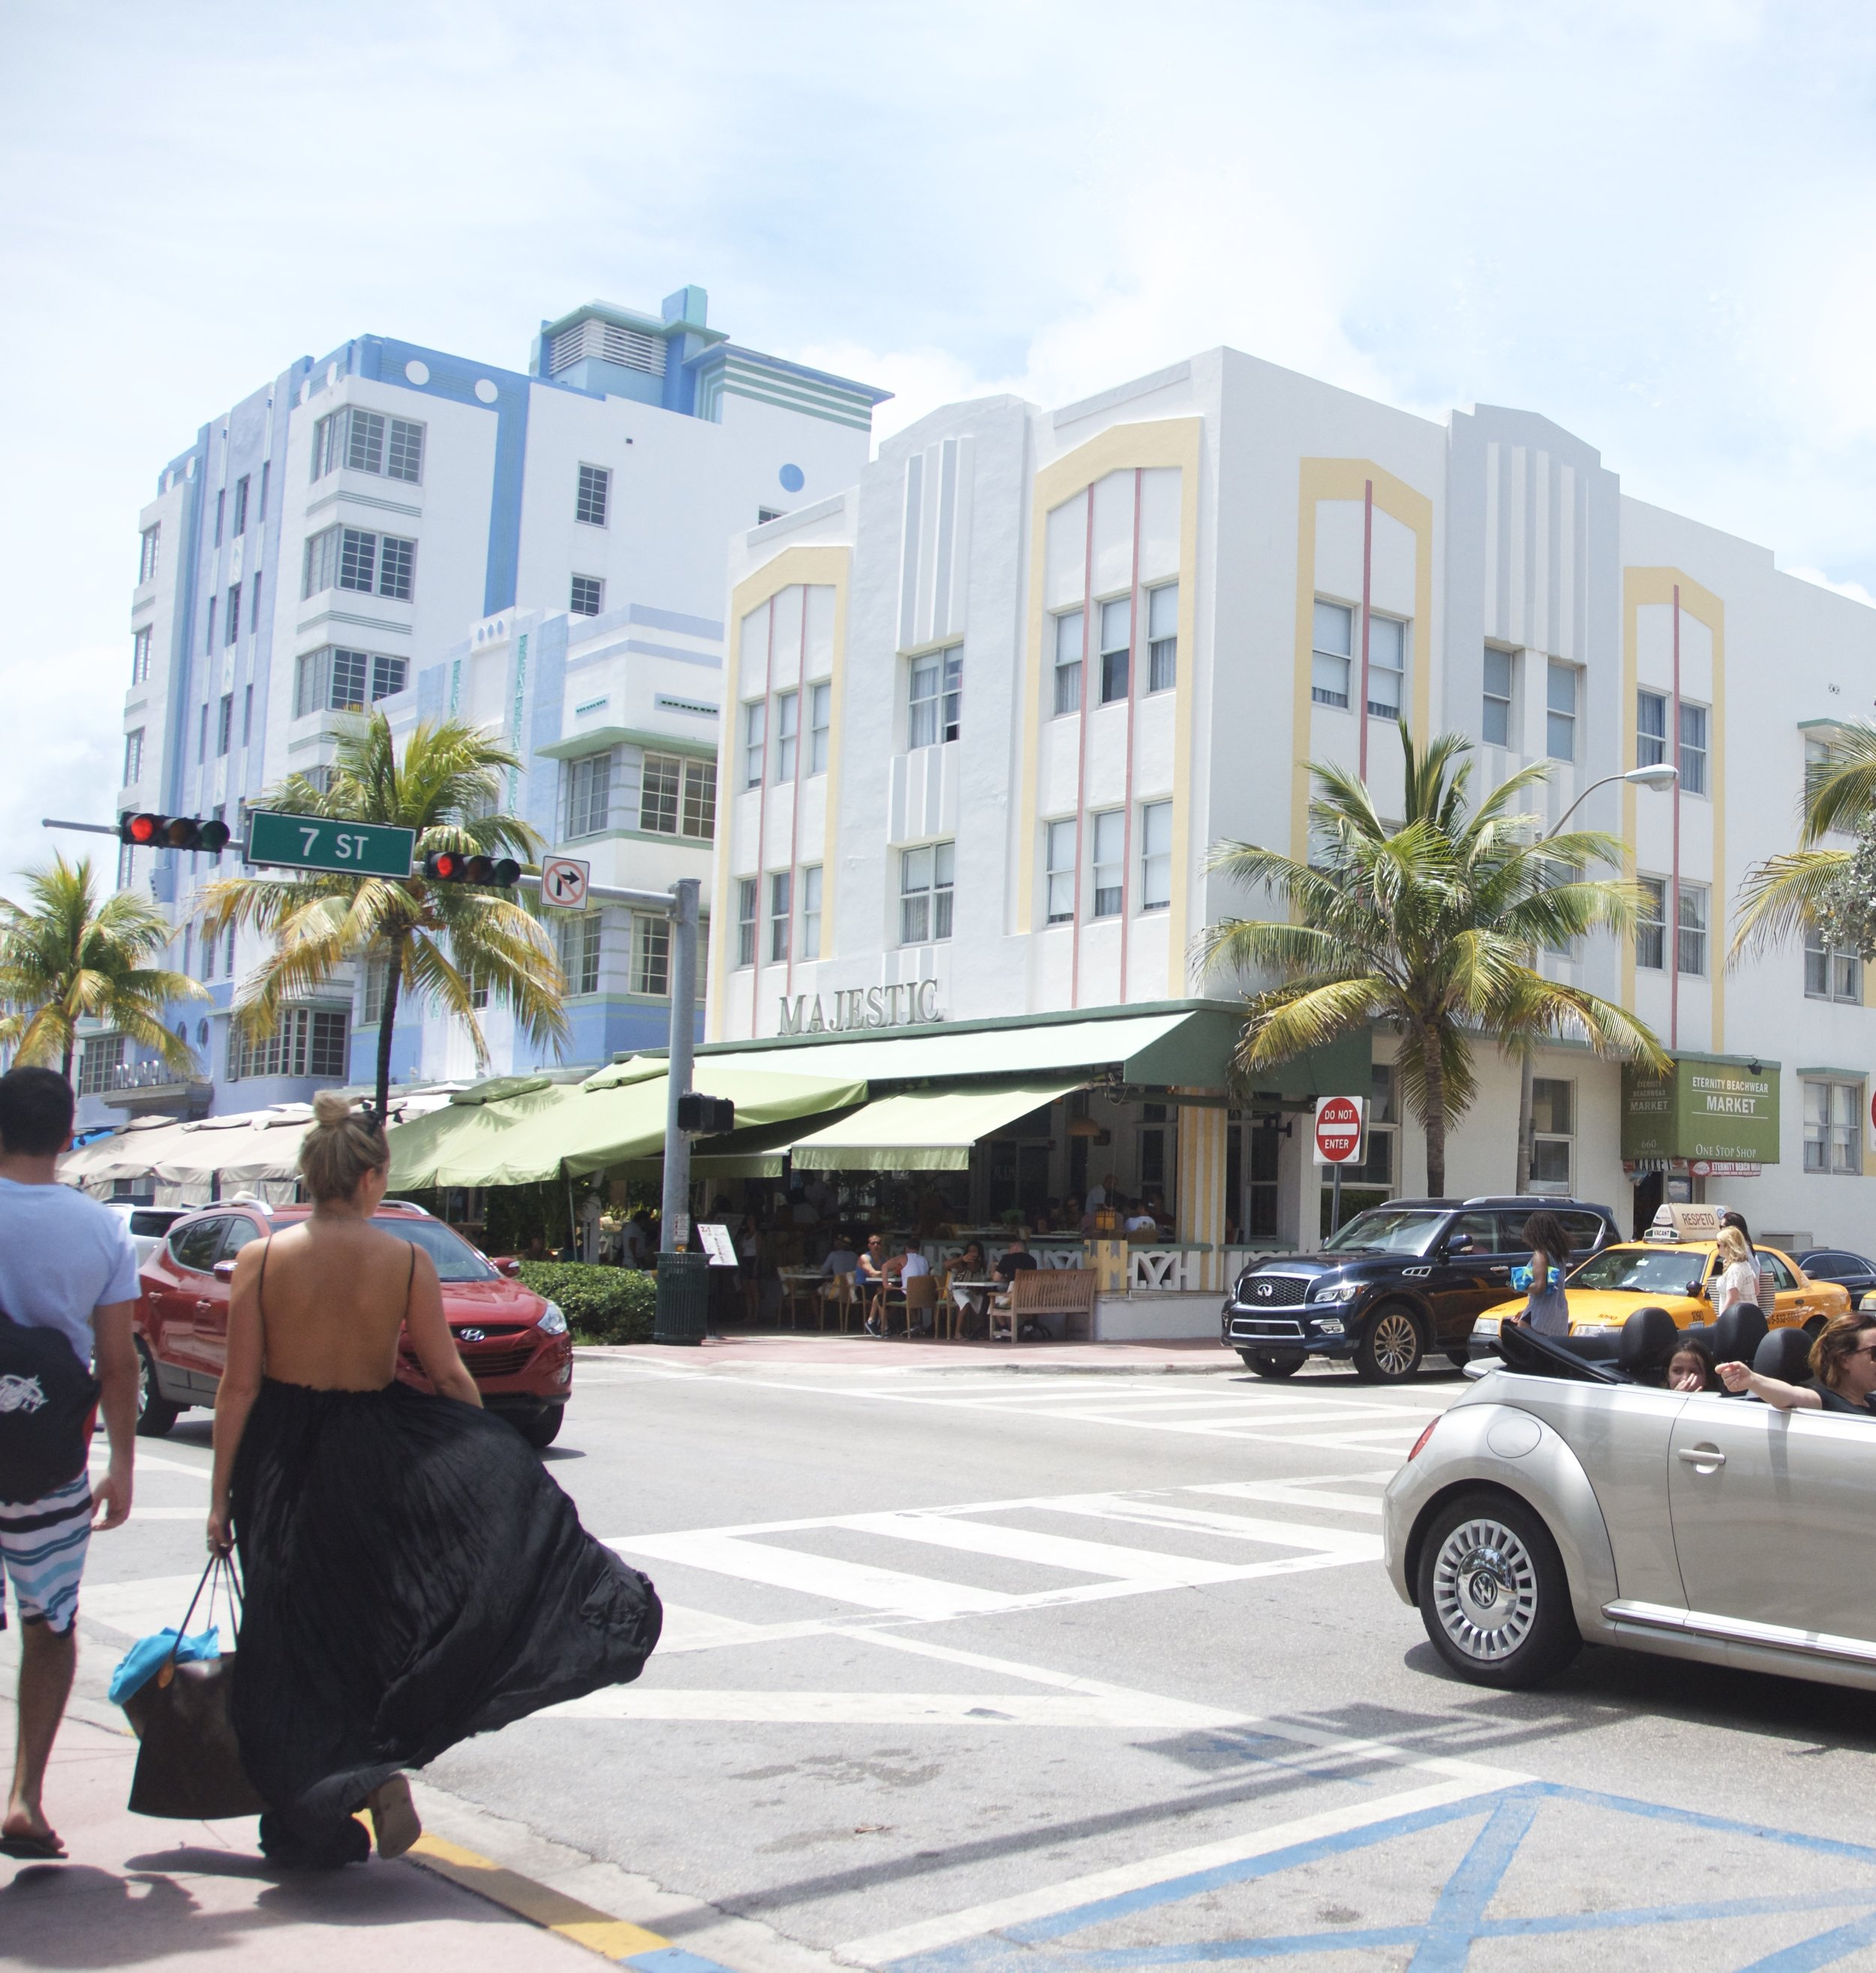 Art Deco Buildings in SoBe